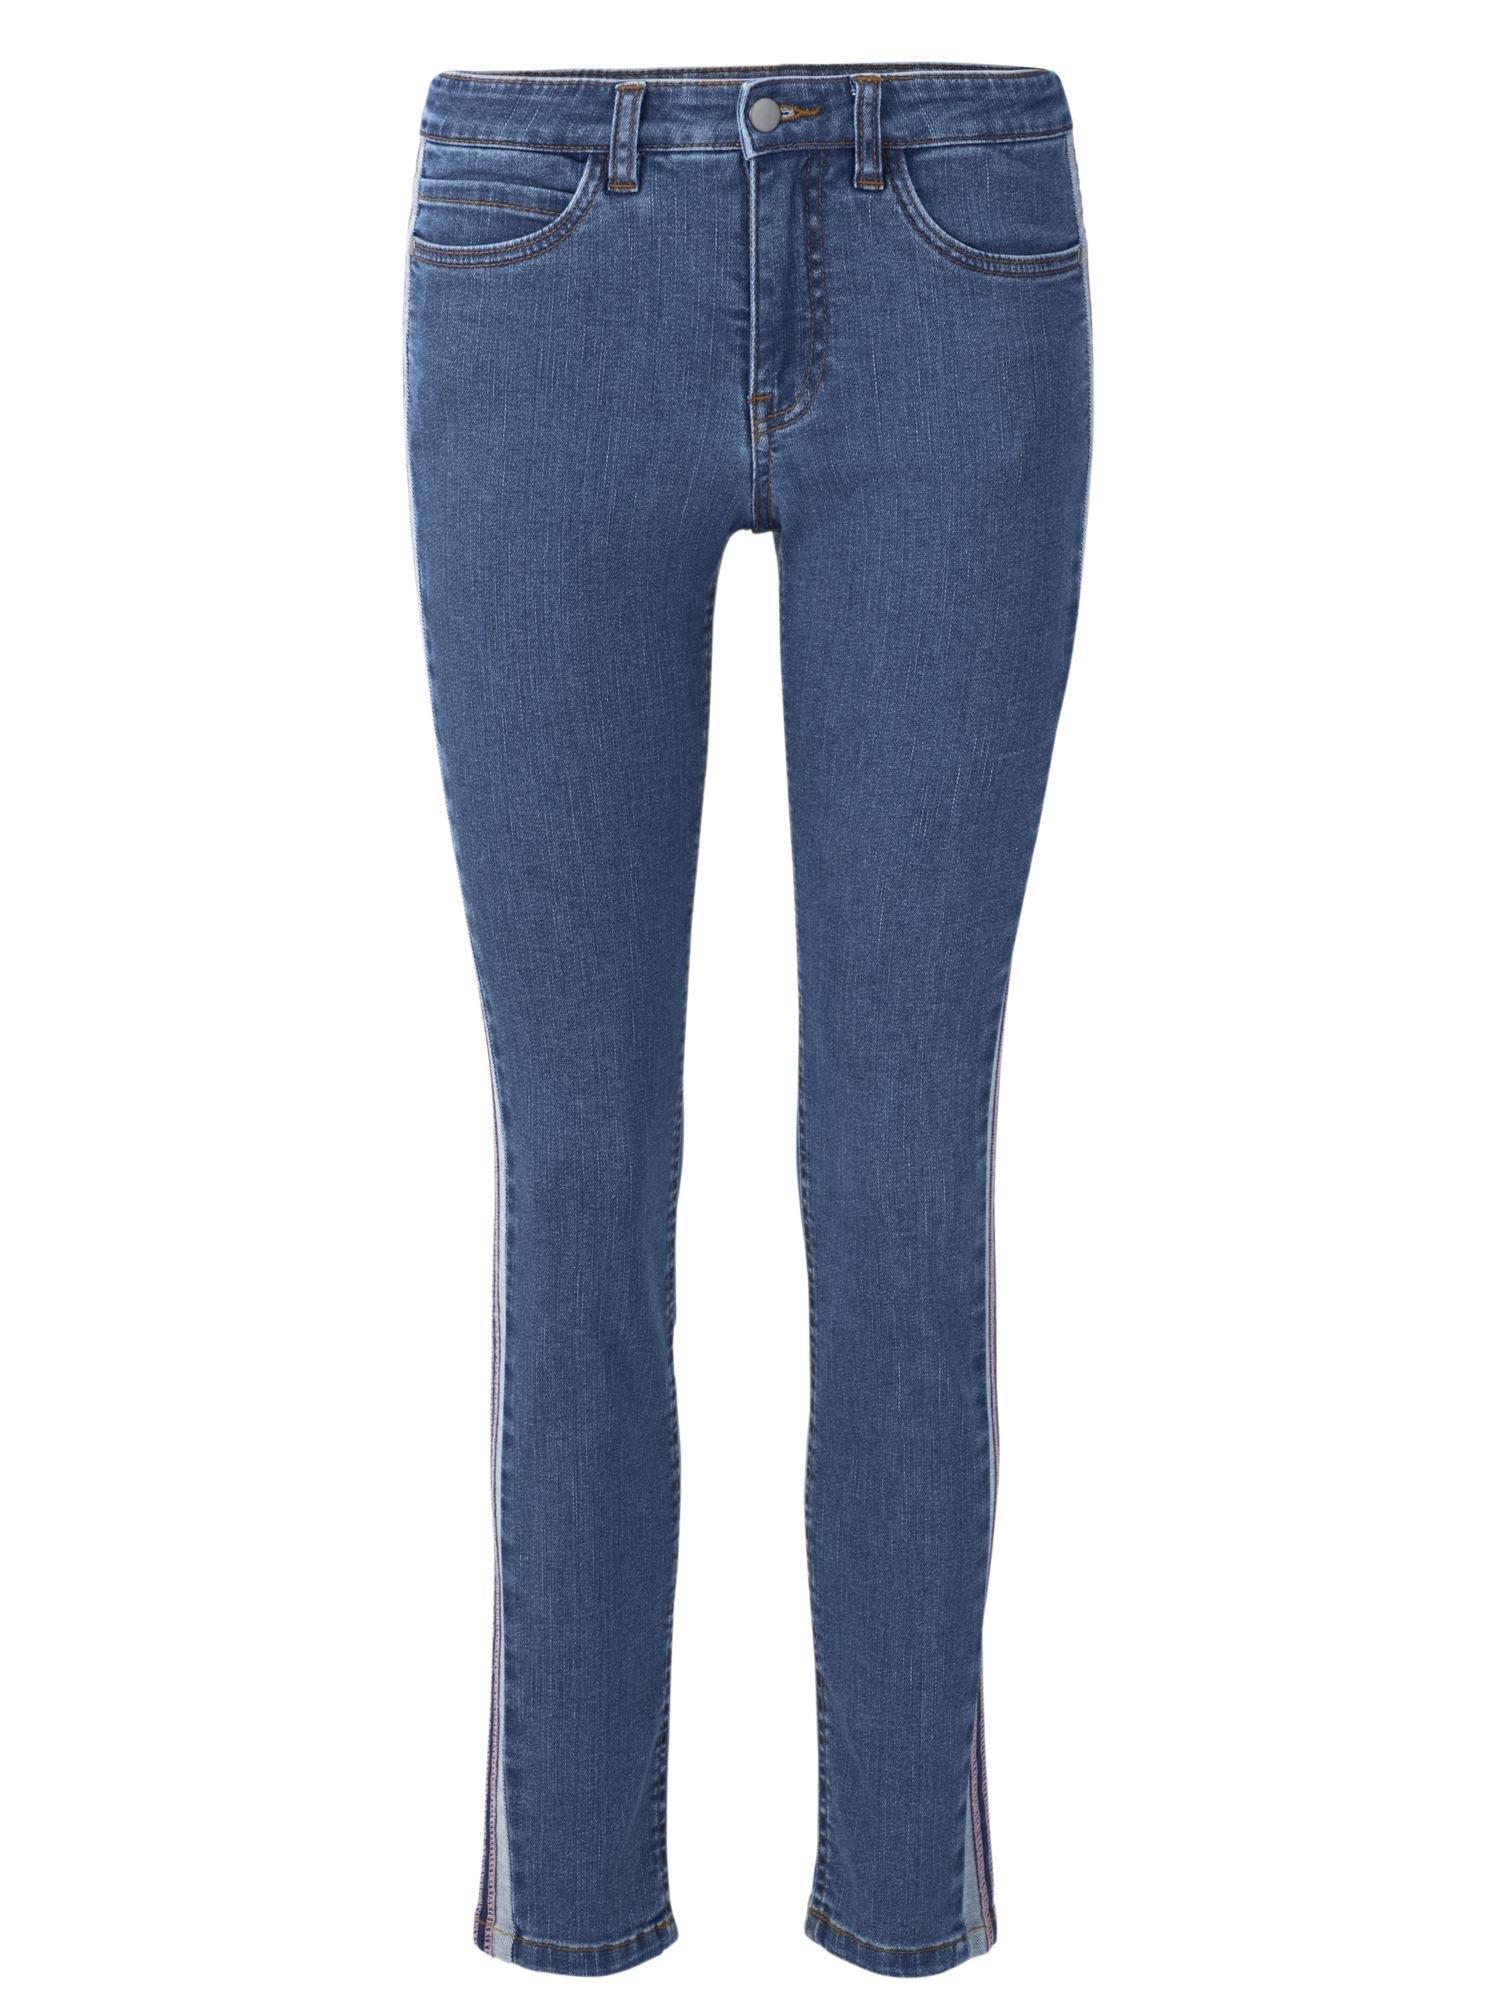 Rick Cardona By Heine Jeans bij OTTO online kopen